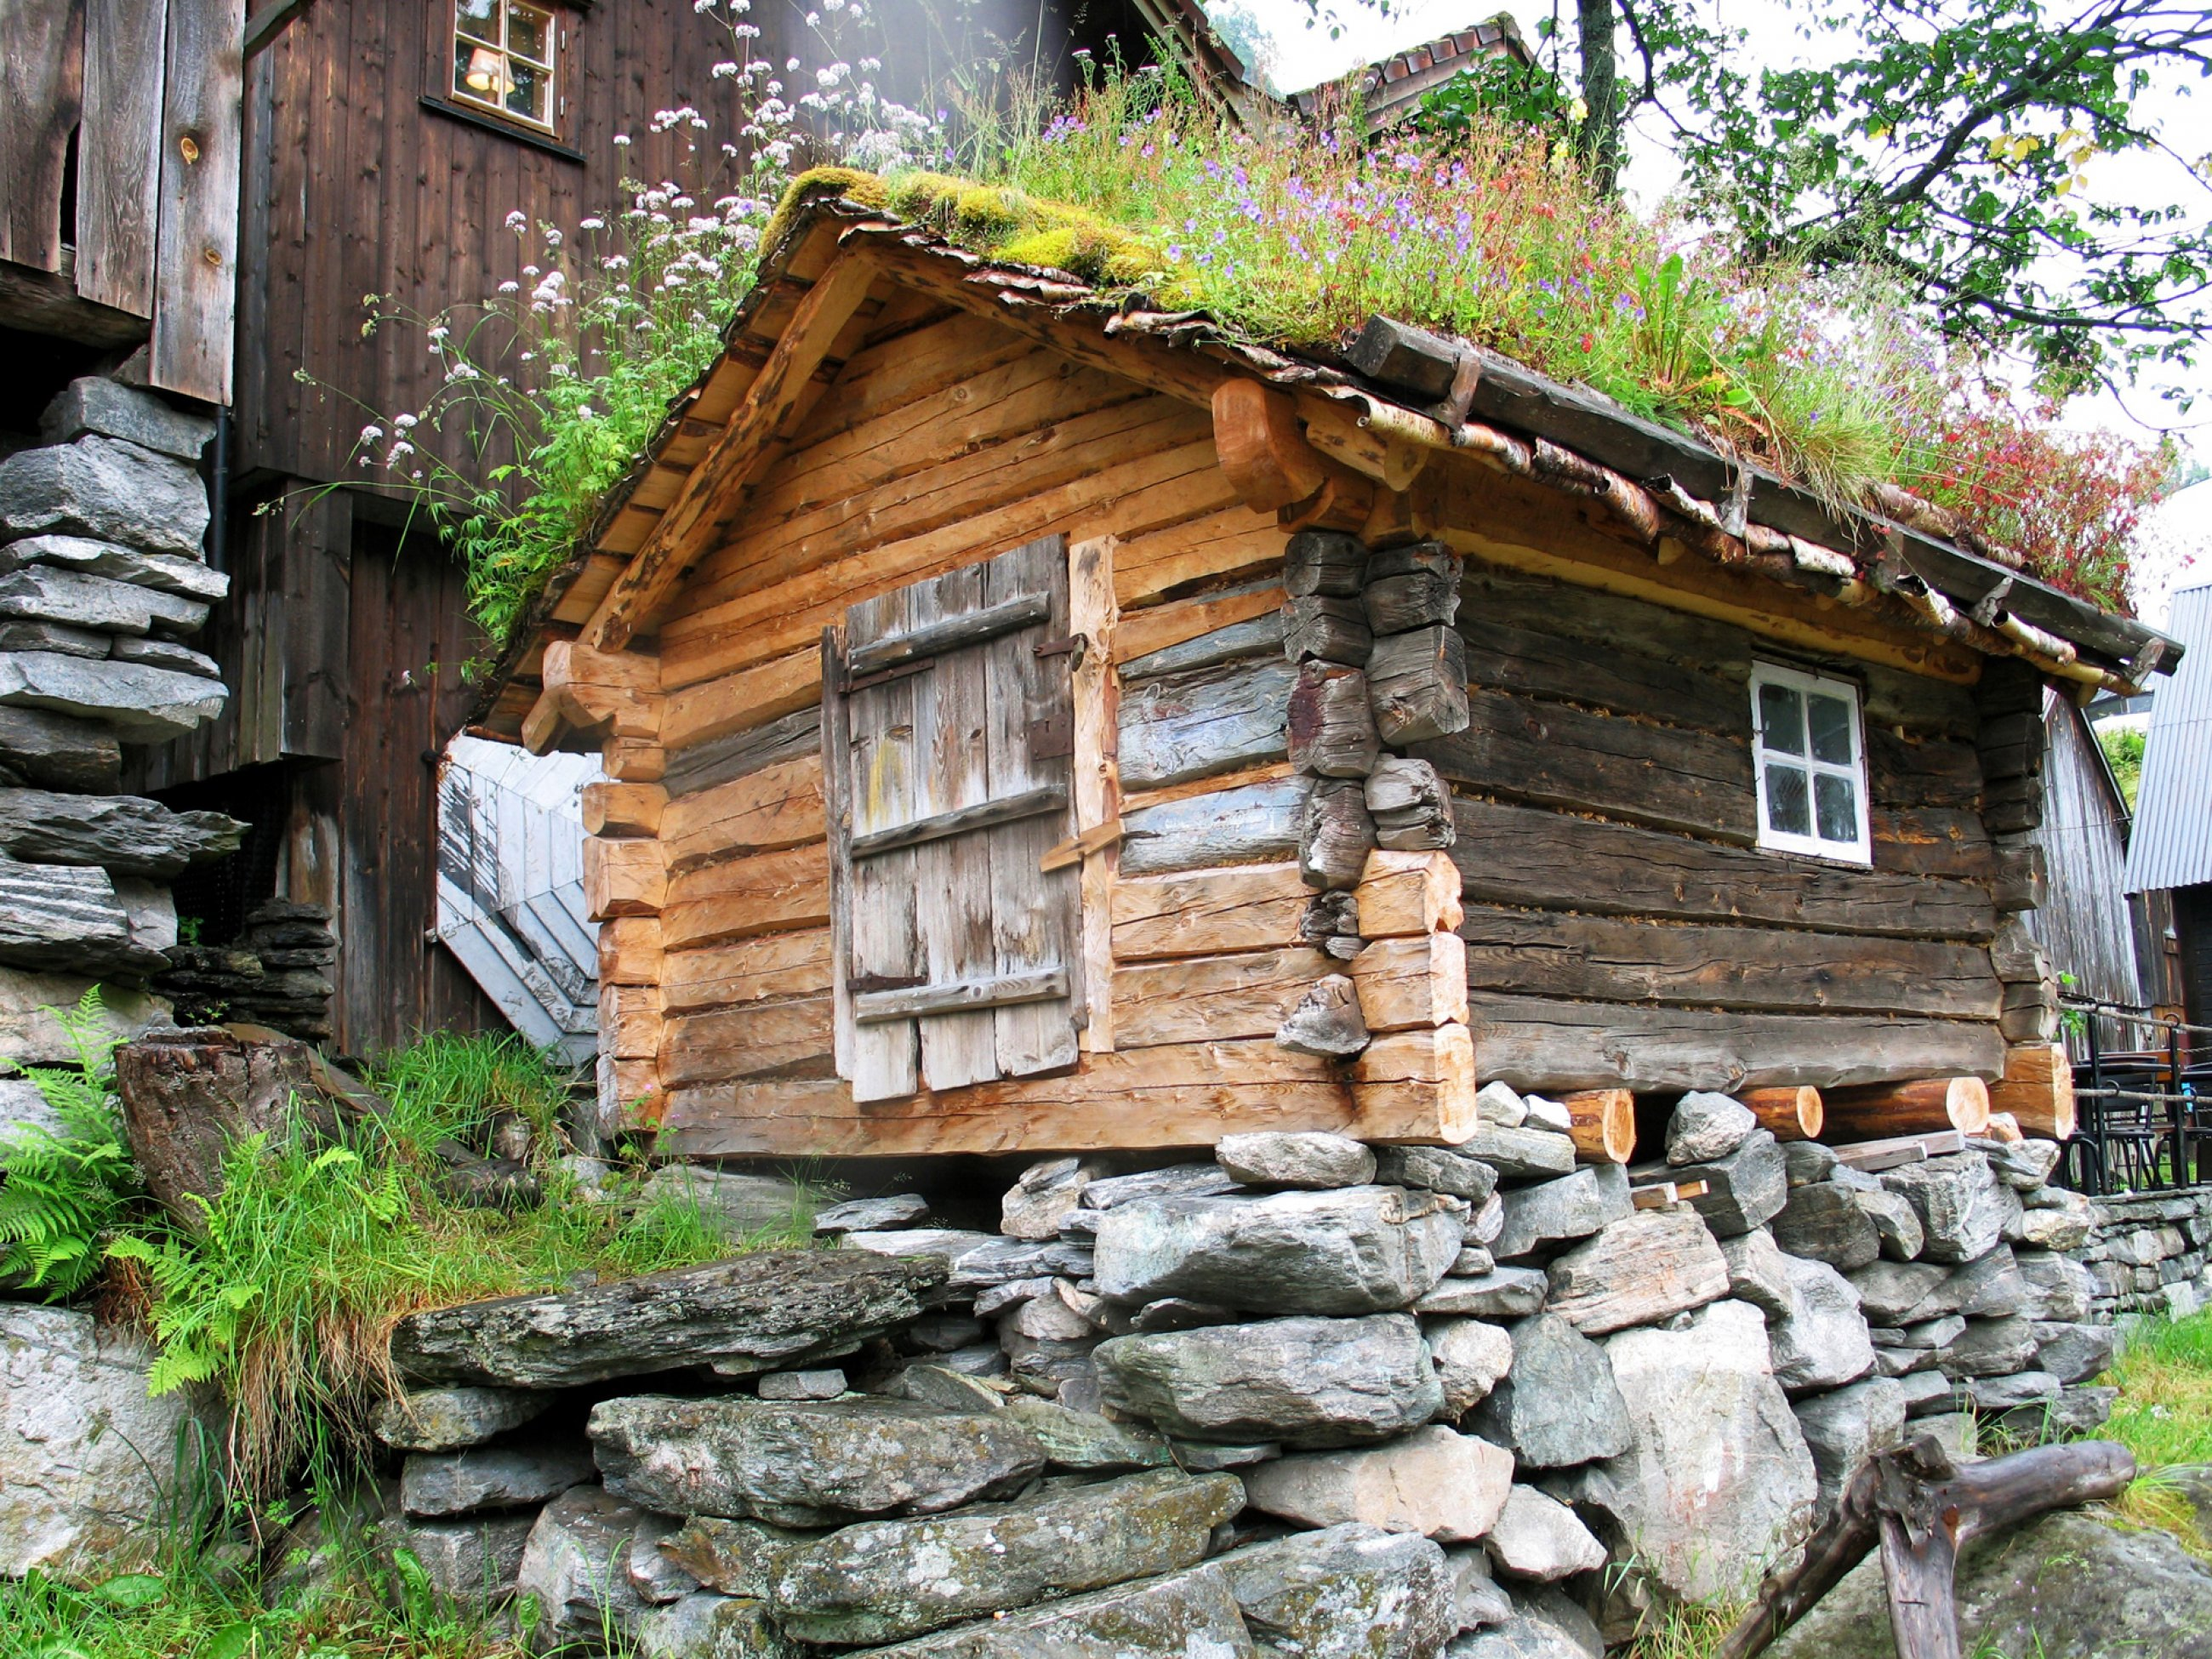 https://bubo.sk/uploads/galleries/7531/norsko-lod-miso-gaj-img-6544.jpg